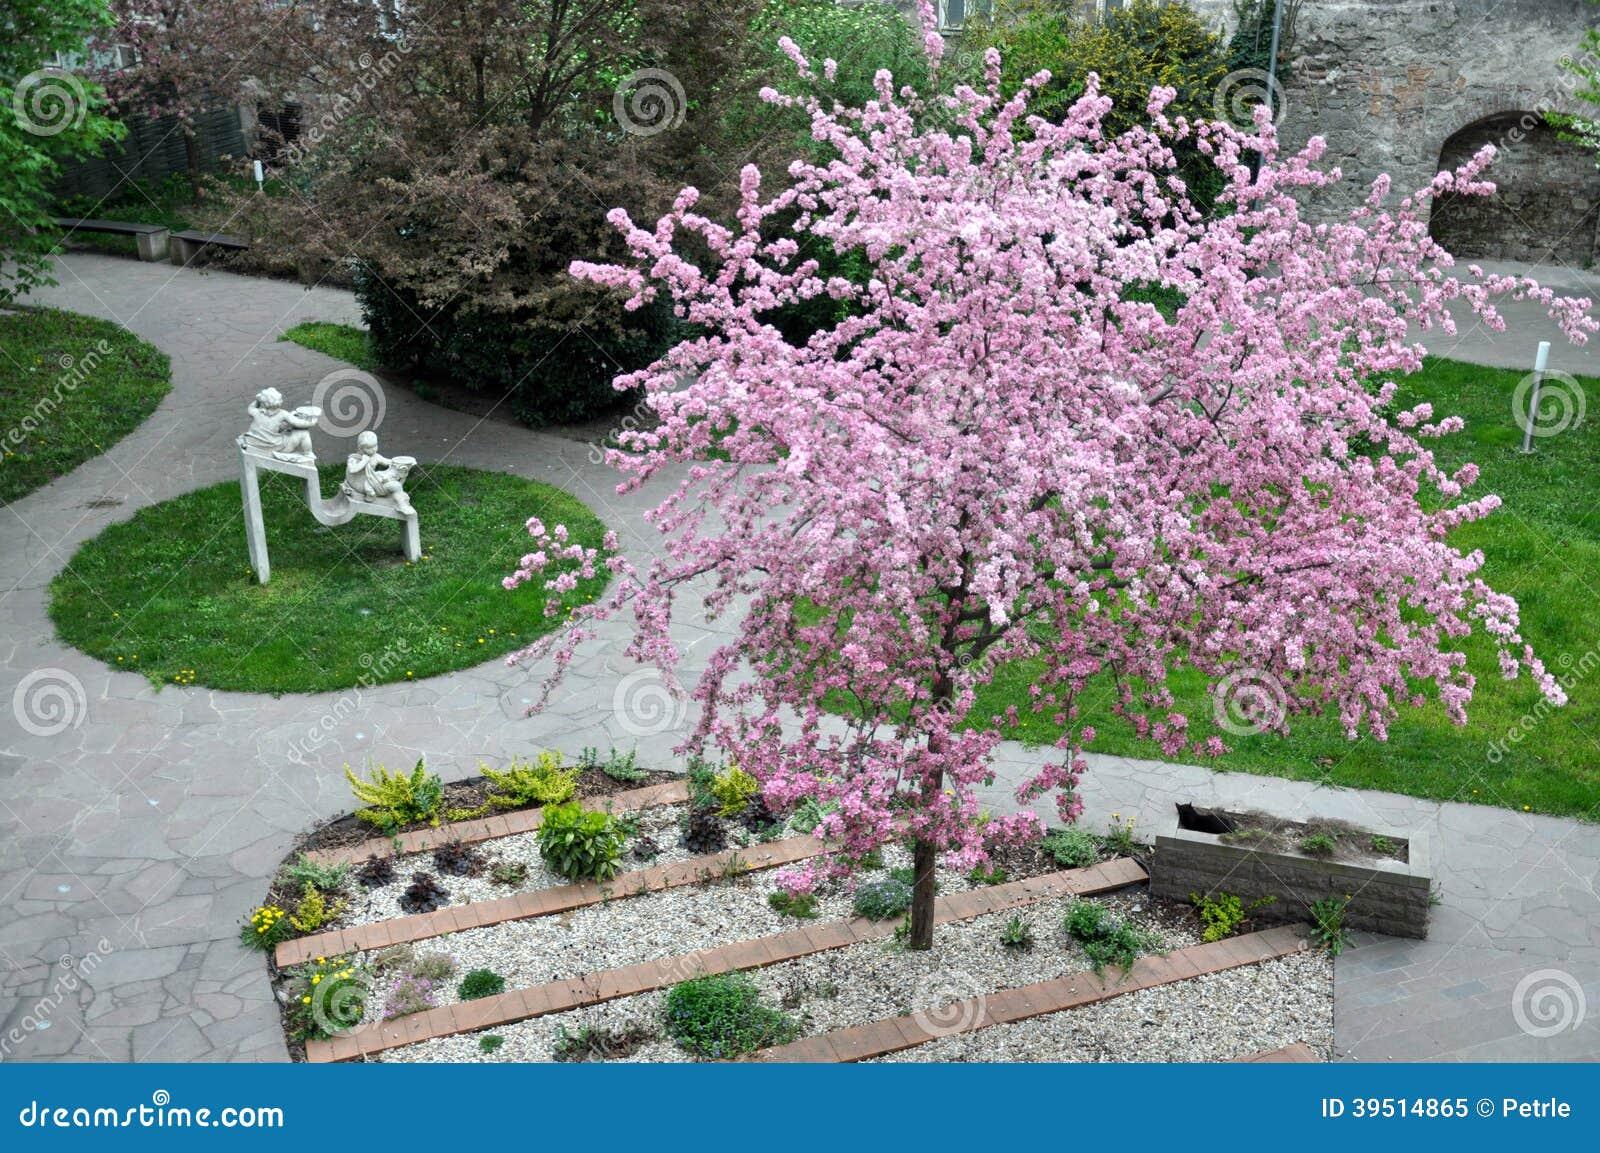 Flowering park and garden